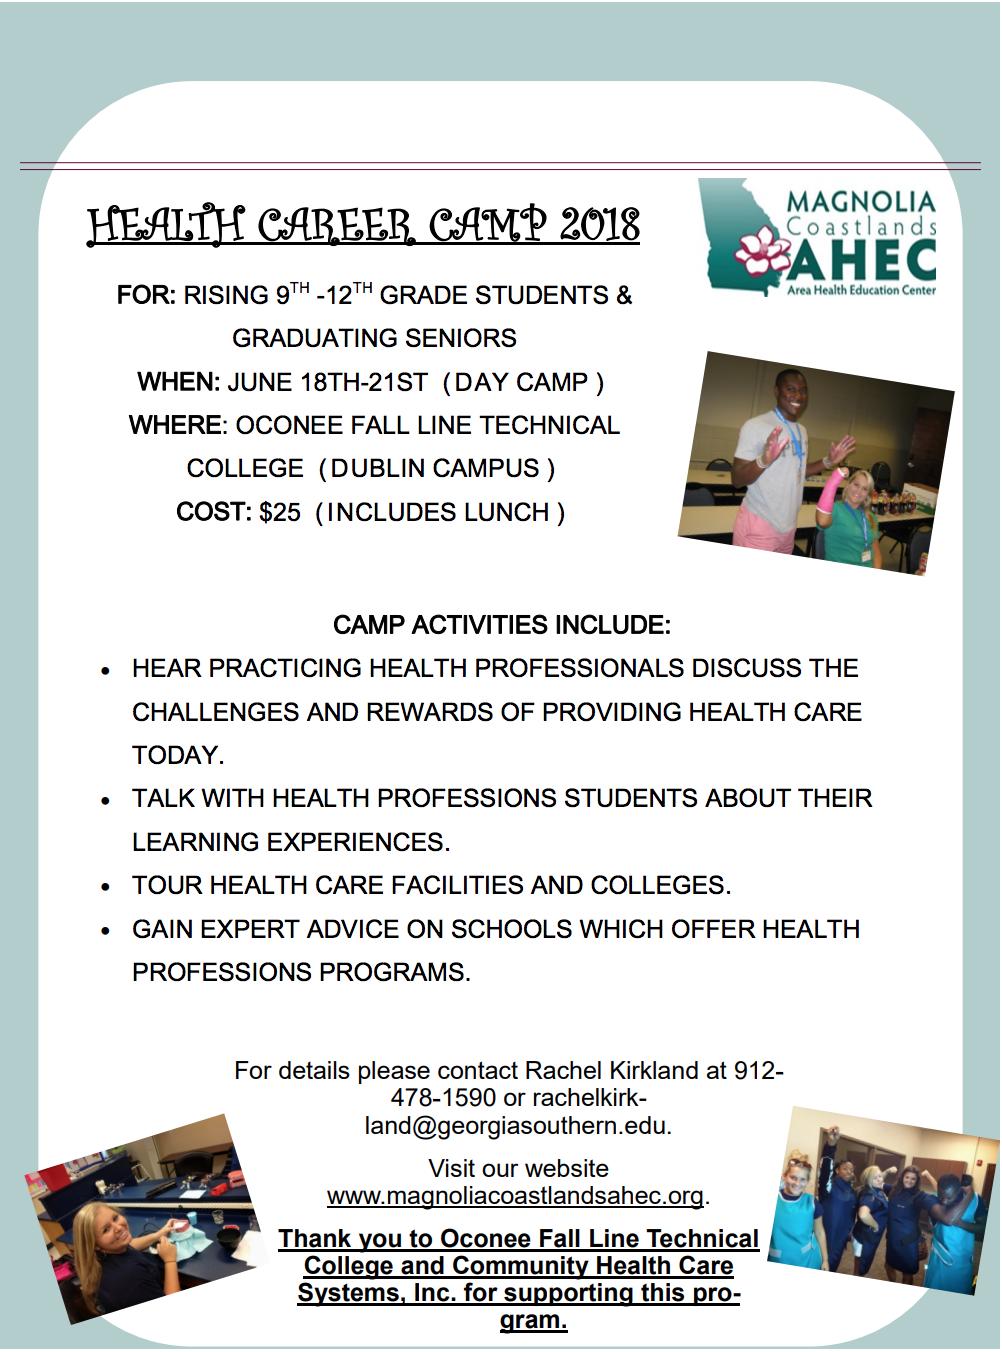 2018 Health Career Camp